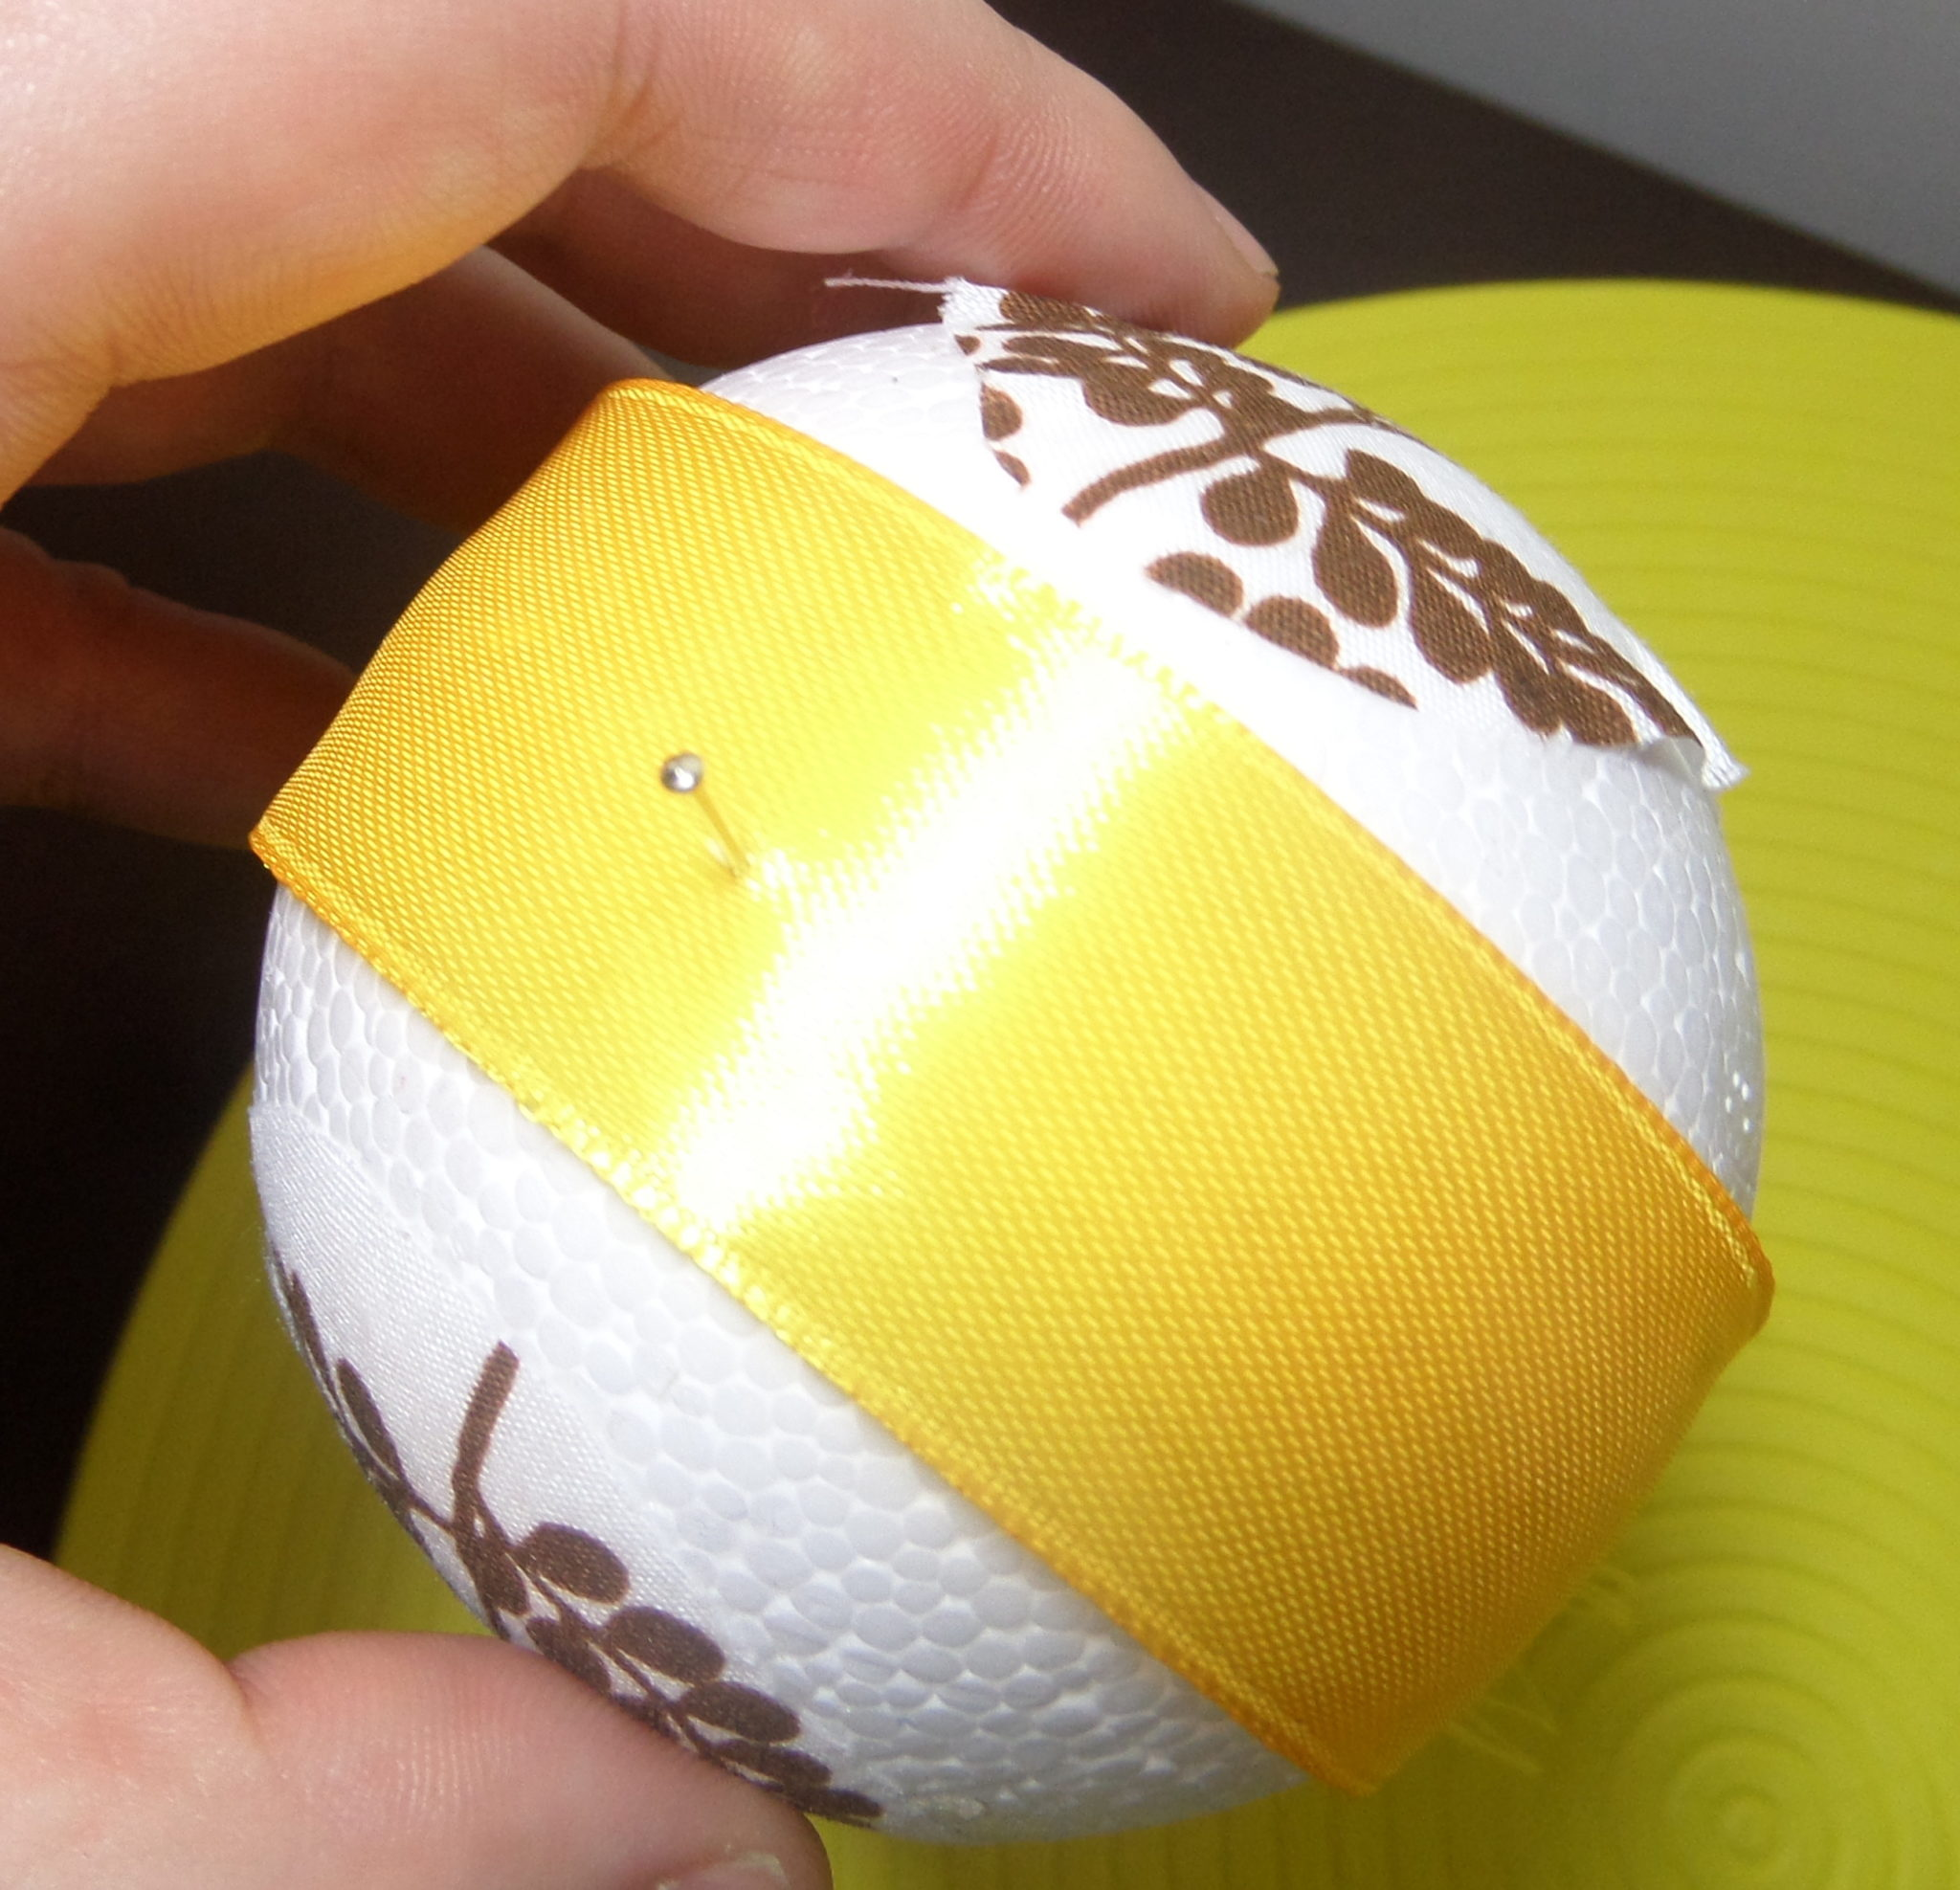 102 - Jajka styropianowe na Wielkanoc